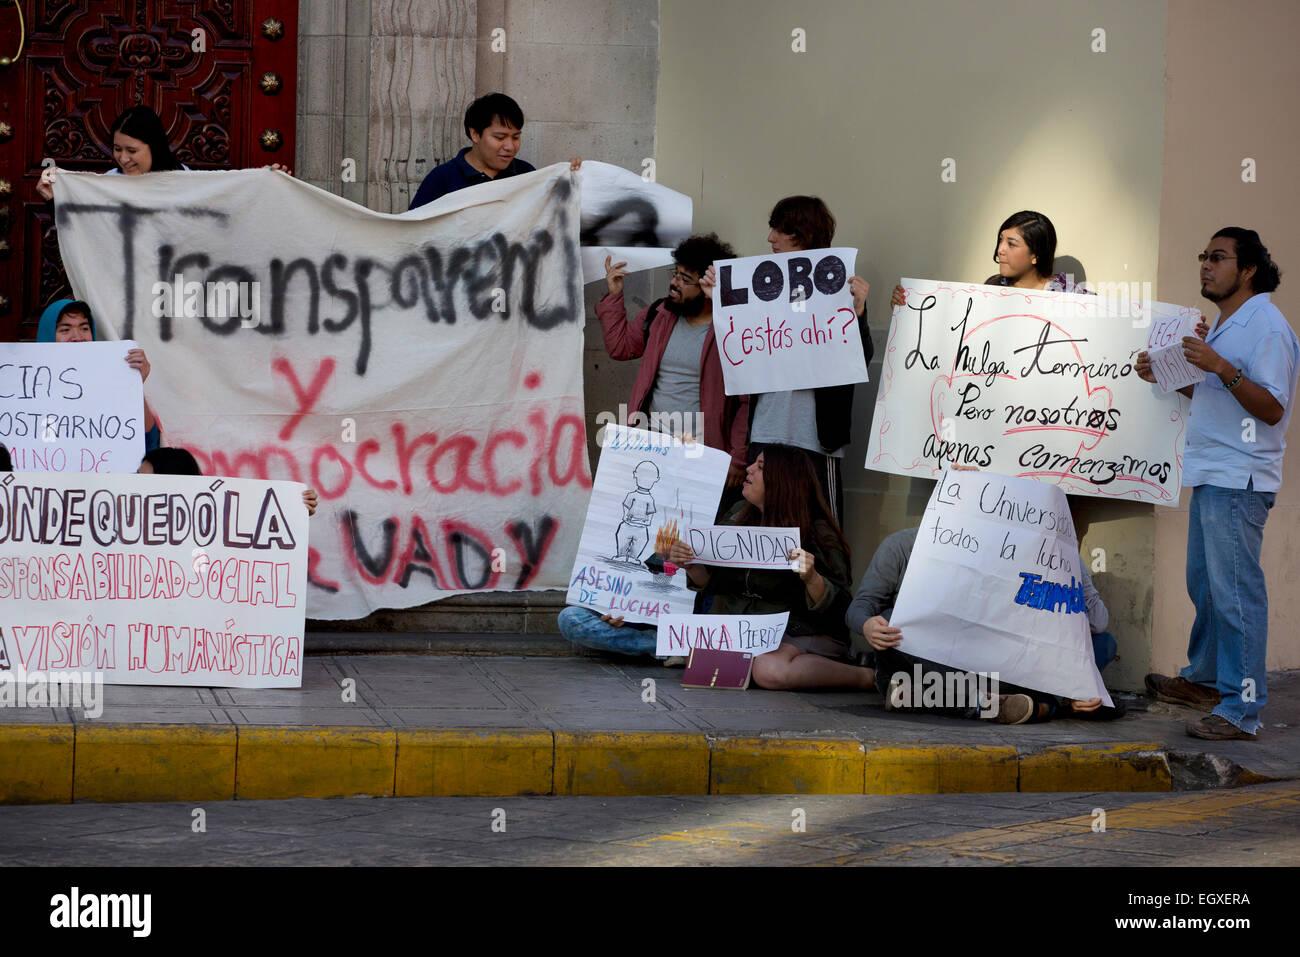 University student demonstration, Merida, Yucatan, Mexico - Stock Image